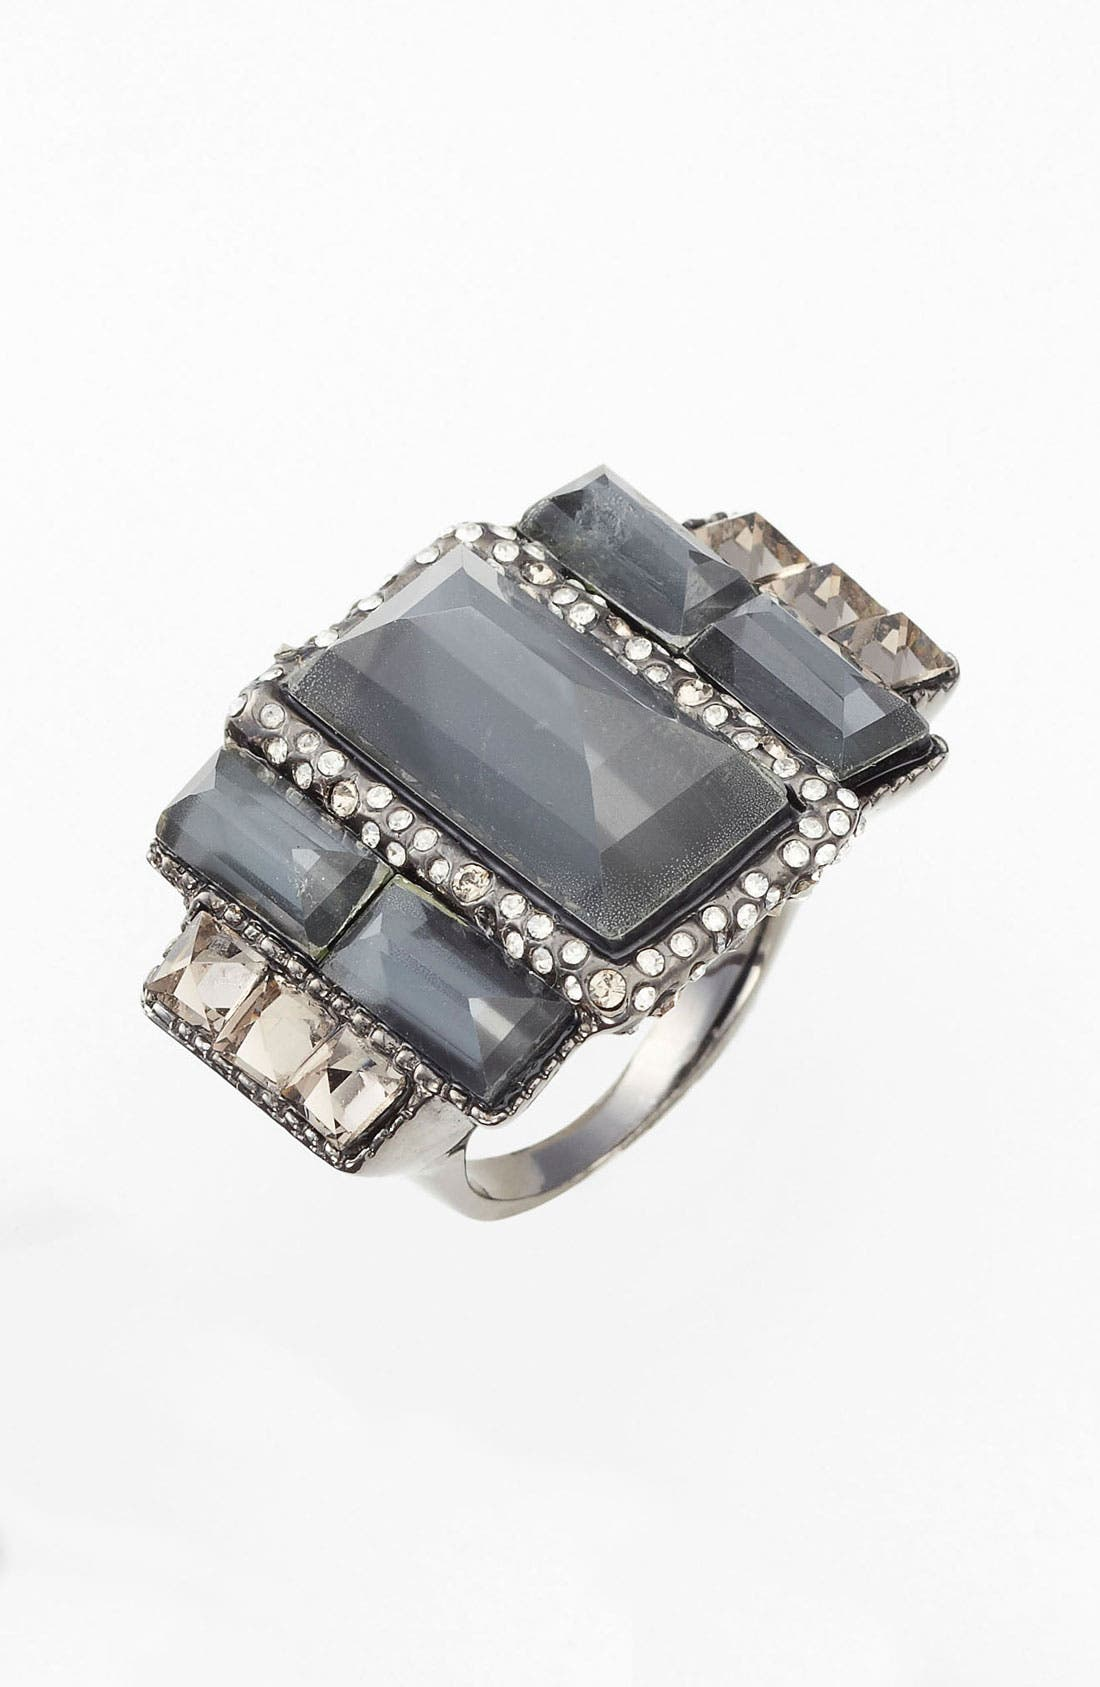 Alternate Image 1 Selected - Alexis Bittar 'Miss Havisham - Bel Air' Stone Ring (Nordstrom Exclusive)